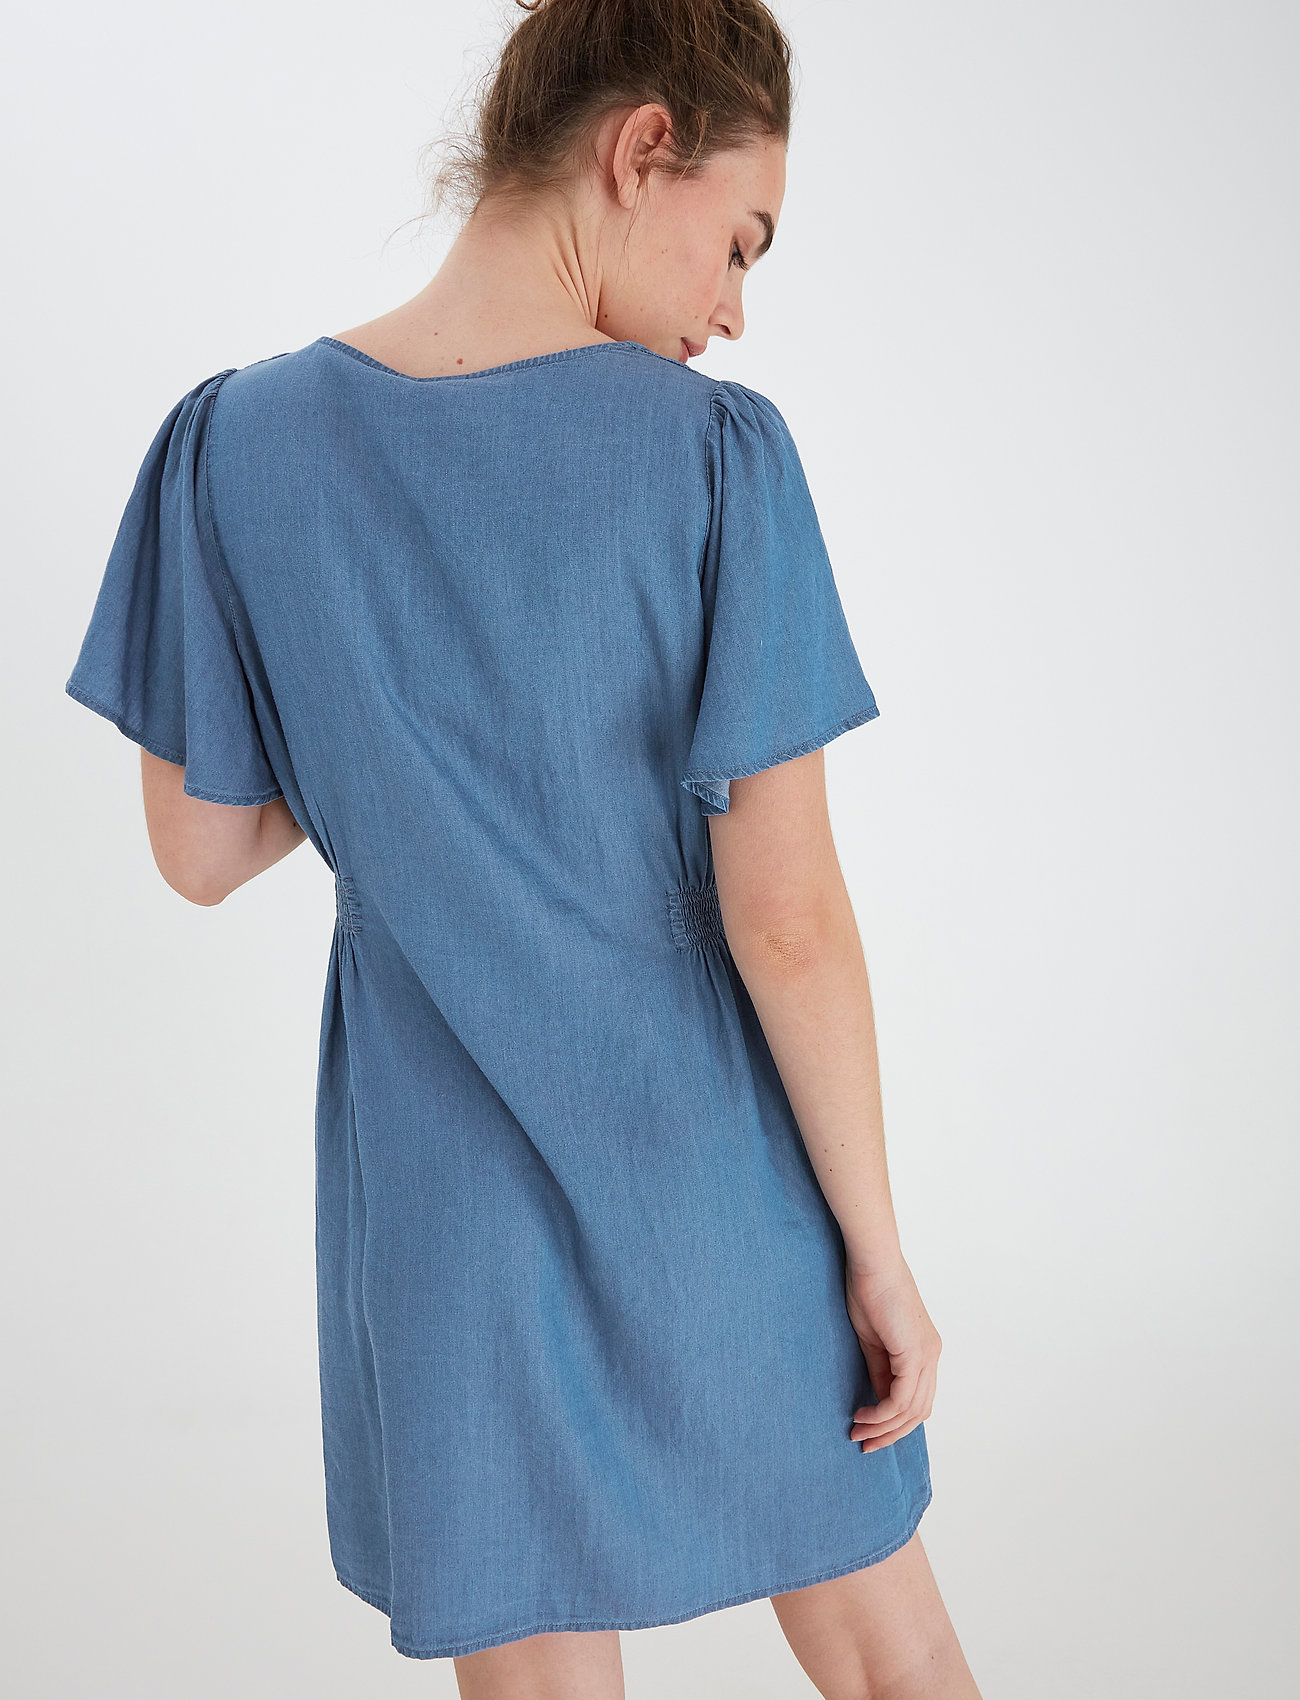 ICHI - IHLAMBREY DR3 - summer dresses - medium blue - 4